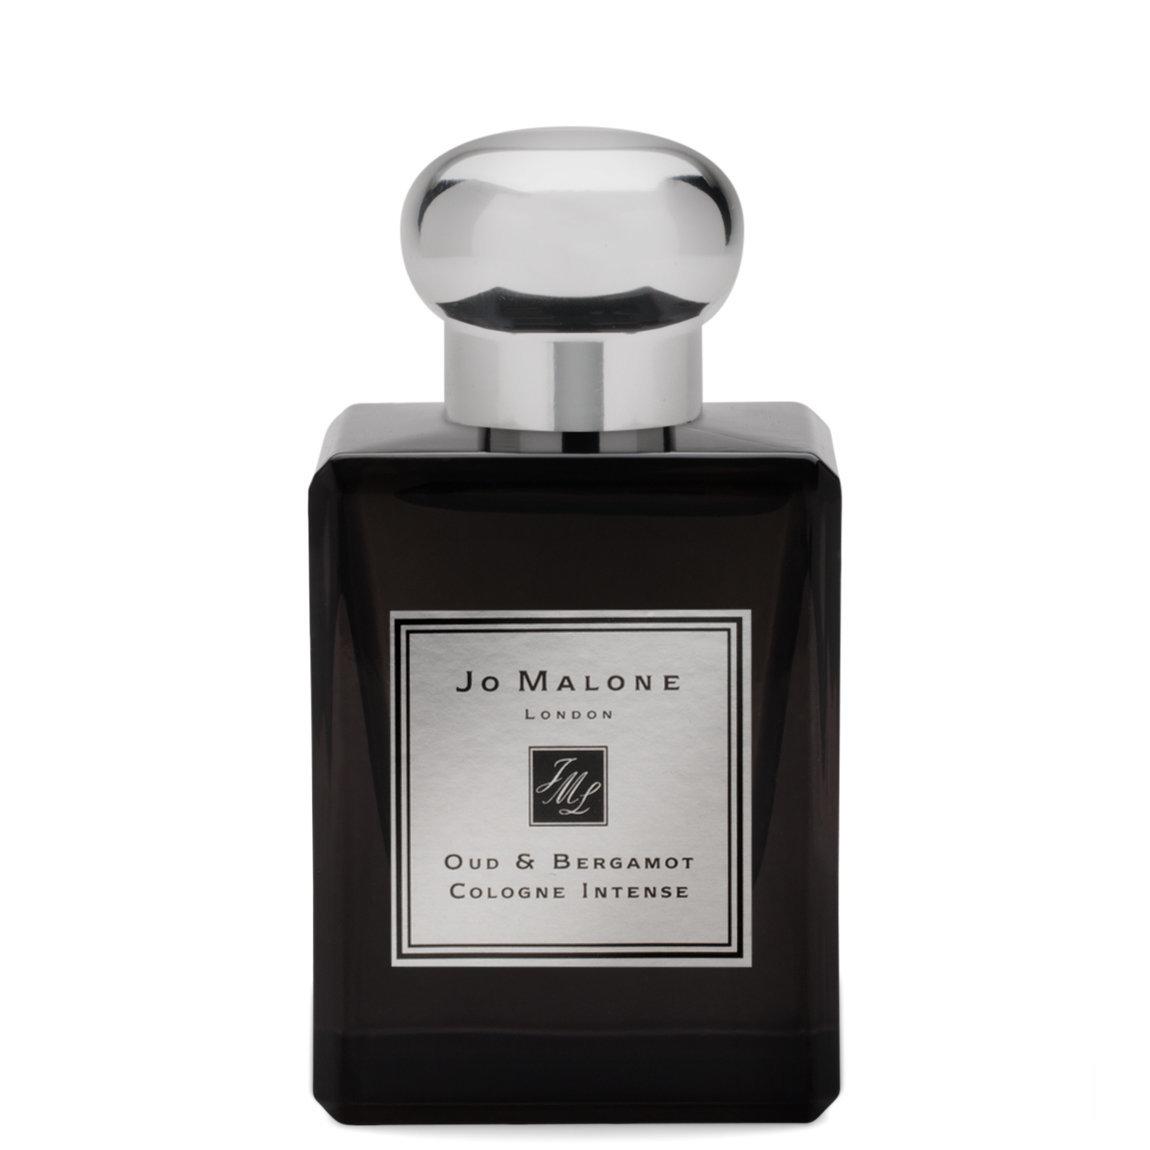 Jo Malone London Oud & Bergamot Cologne Intense 50 ml product swatch.